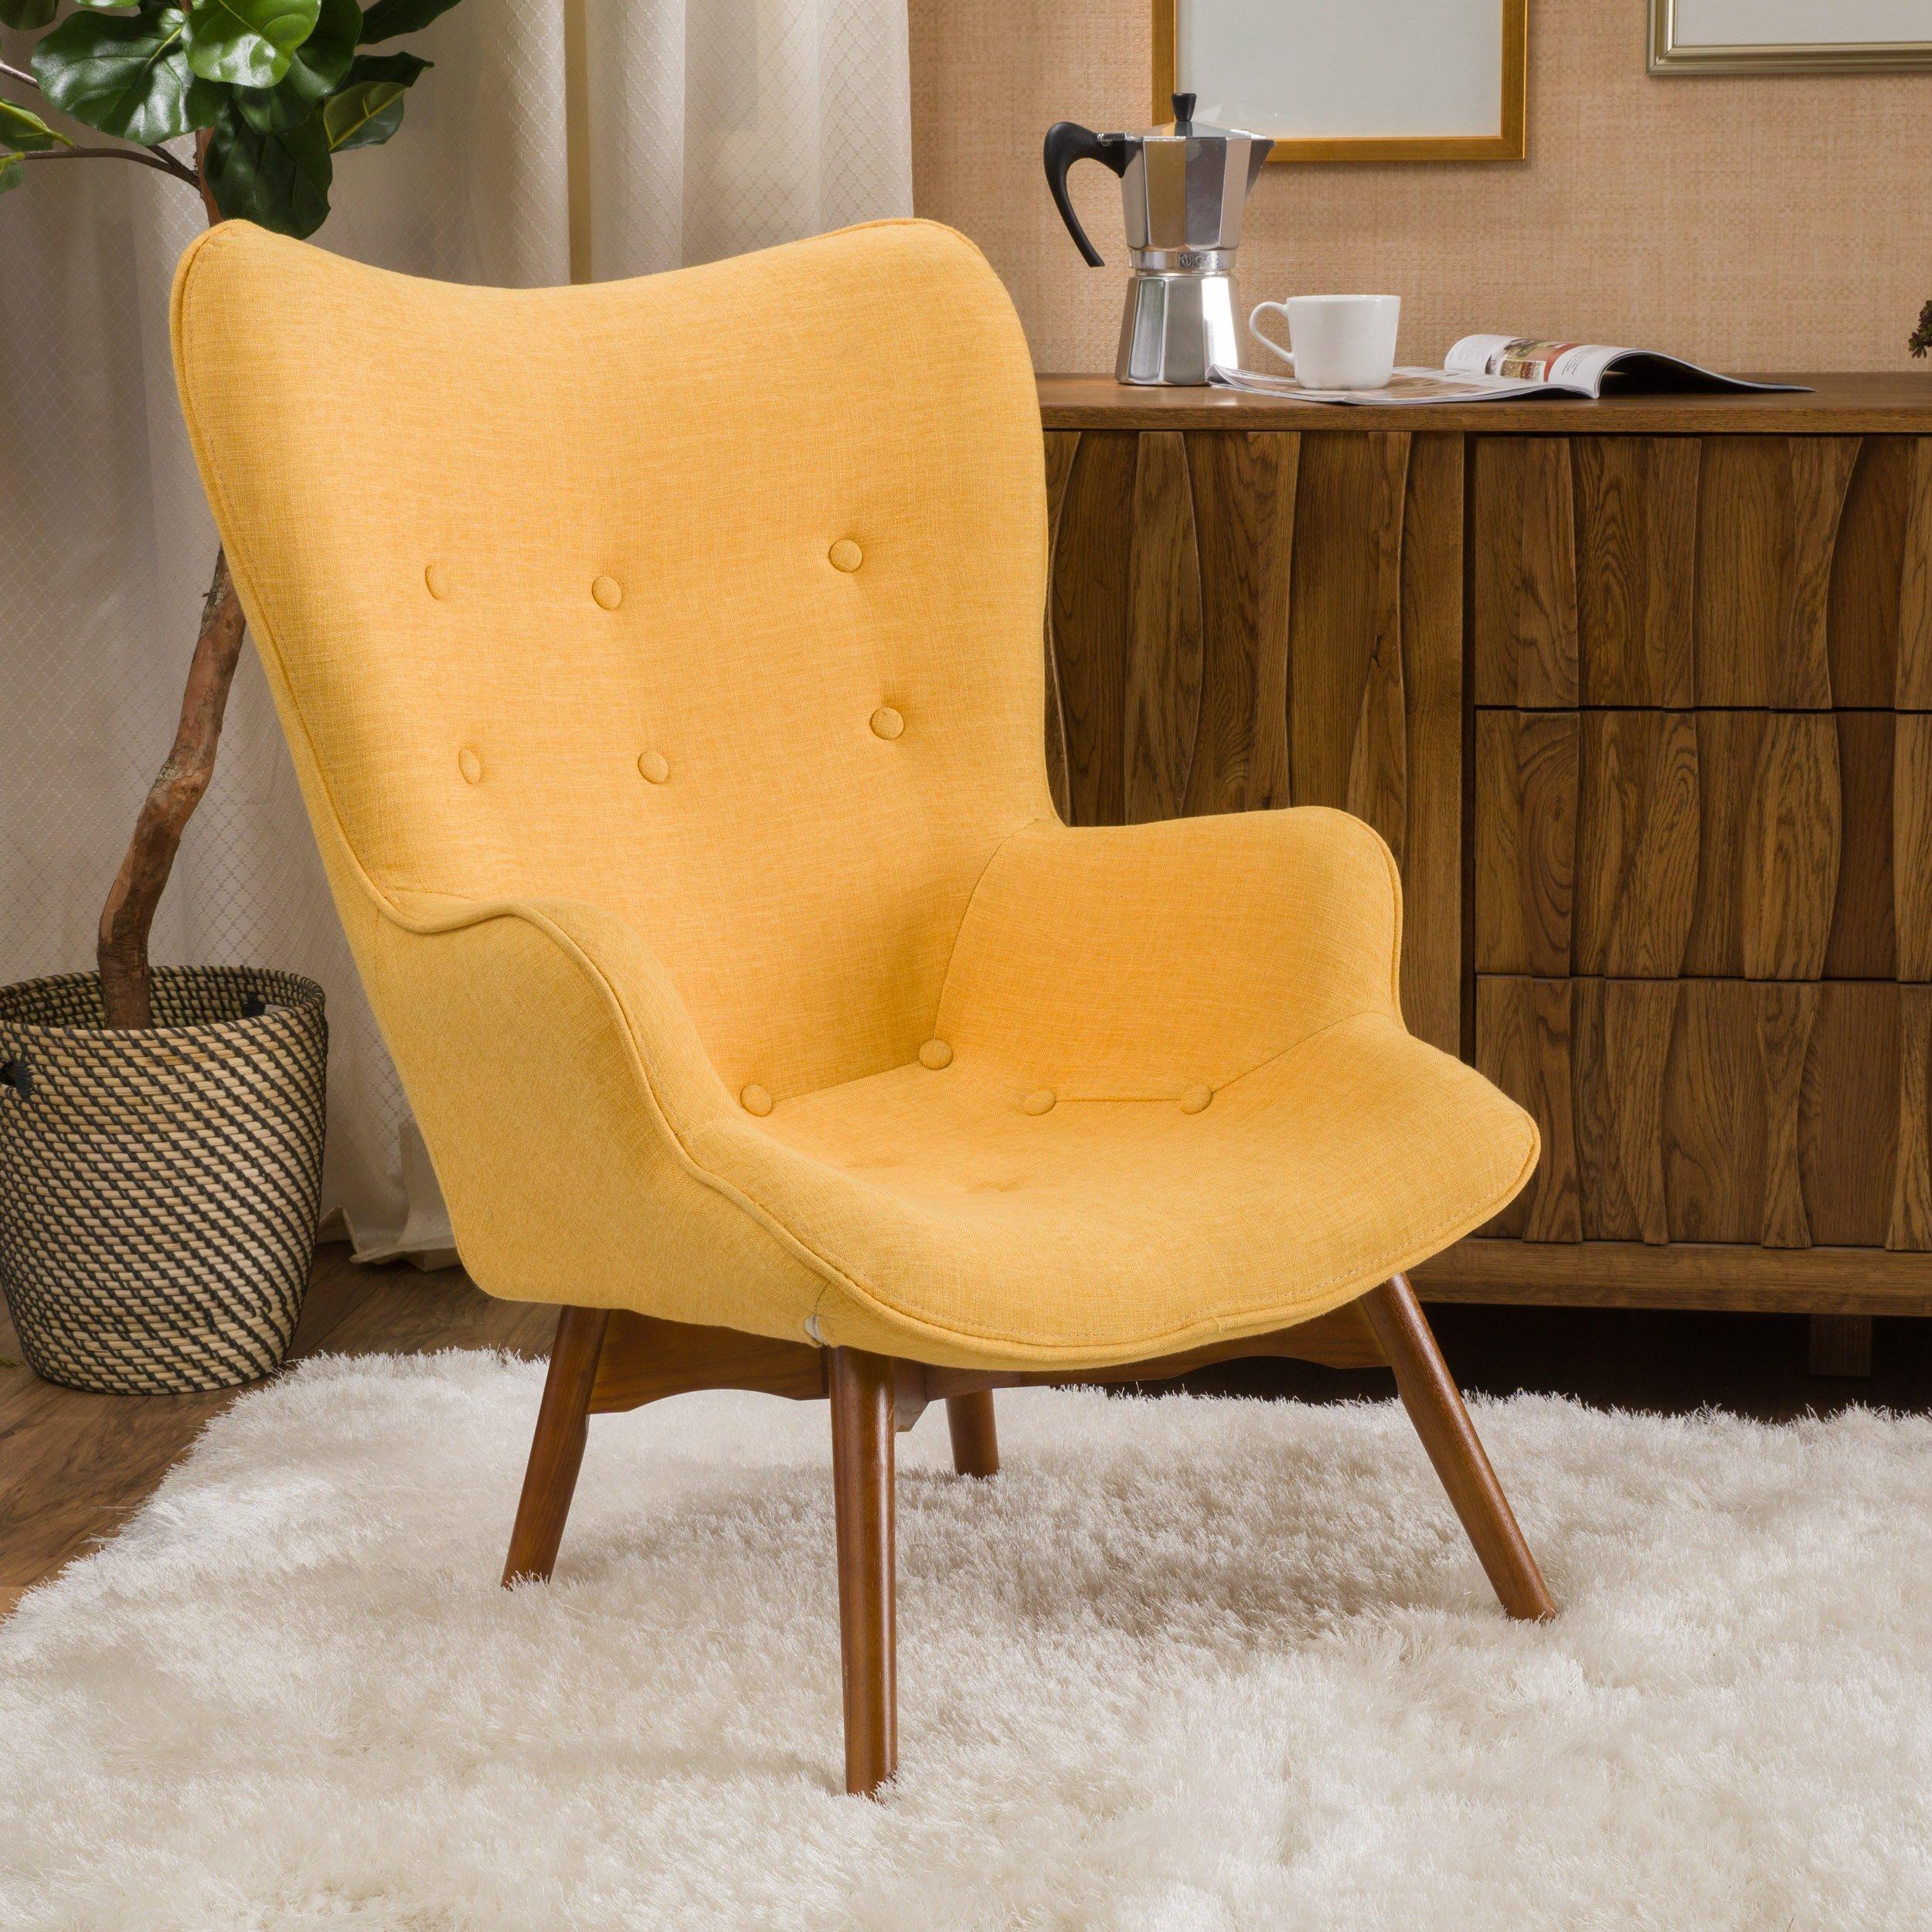 Christopher Knight Home Hariata Fabric Contour Chair, Muted Yellow by Christopher Knight Home